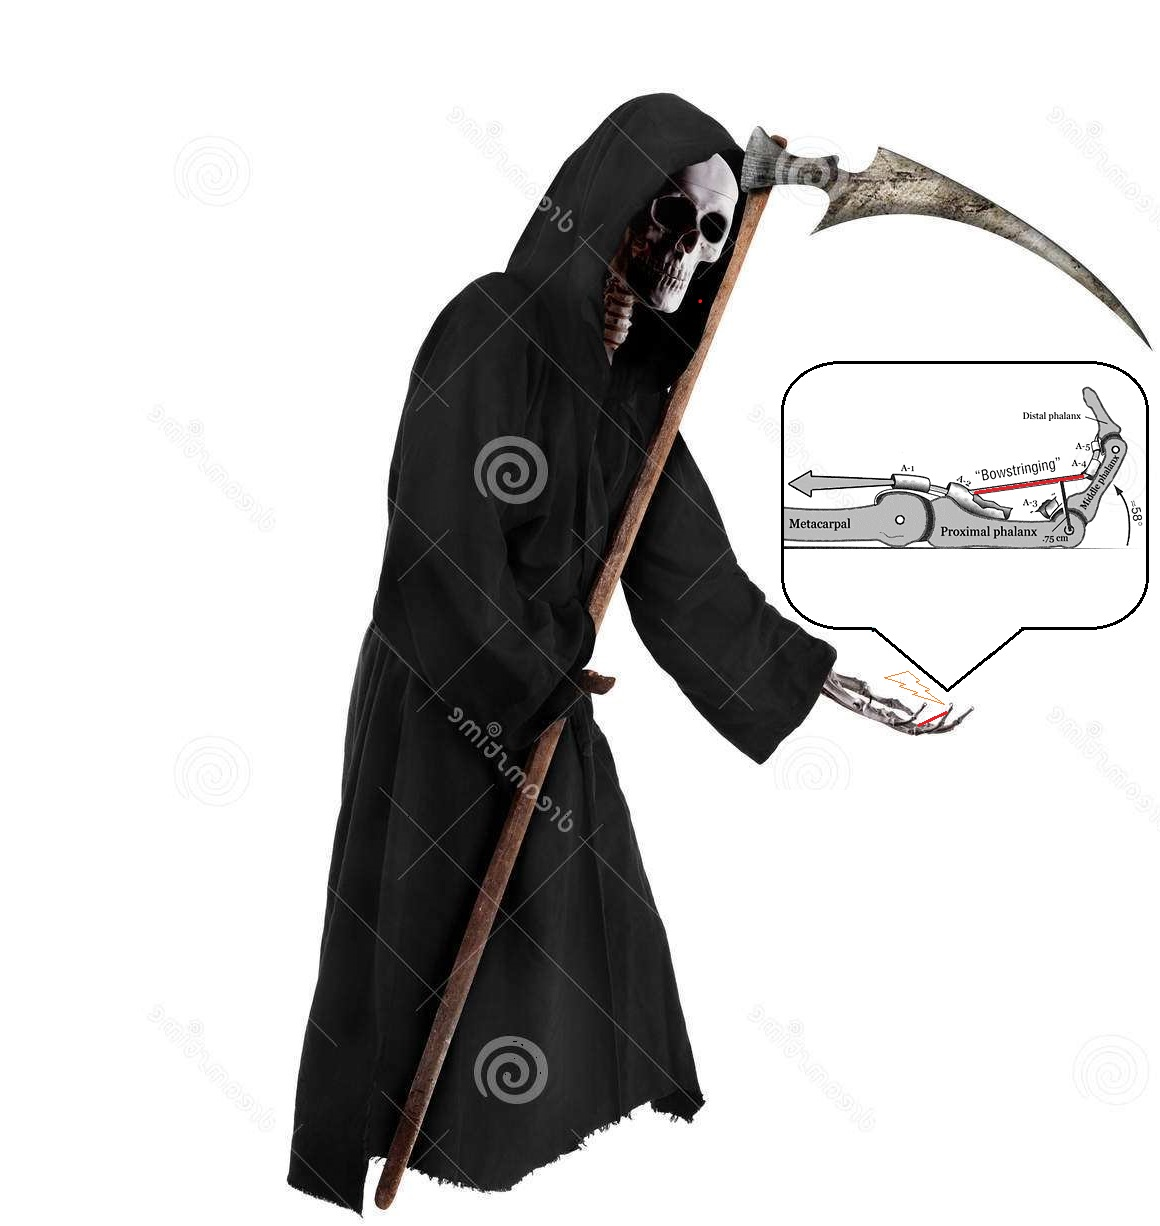 deathfinger